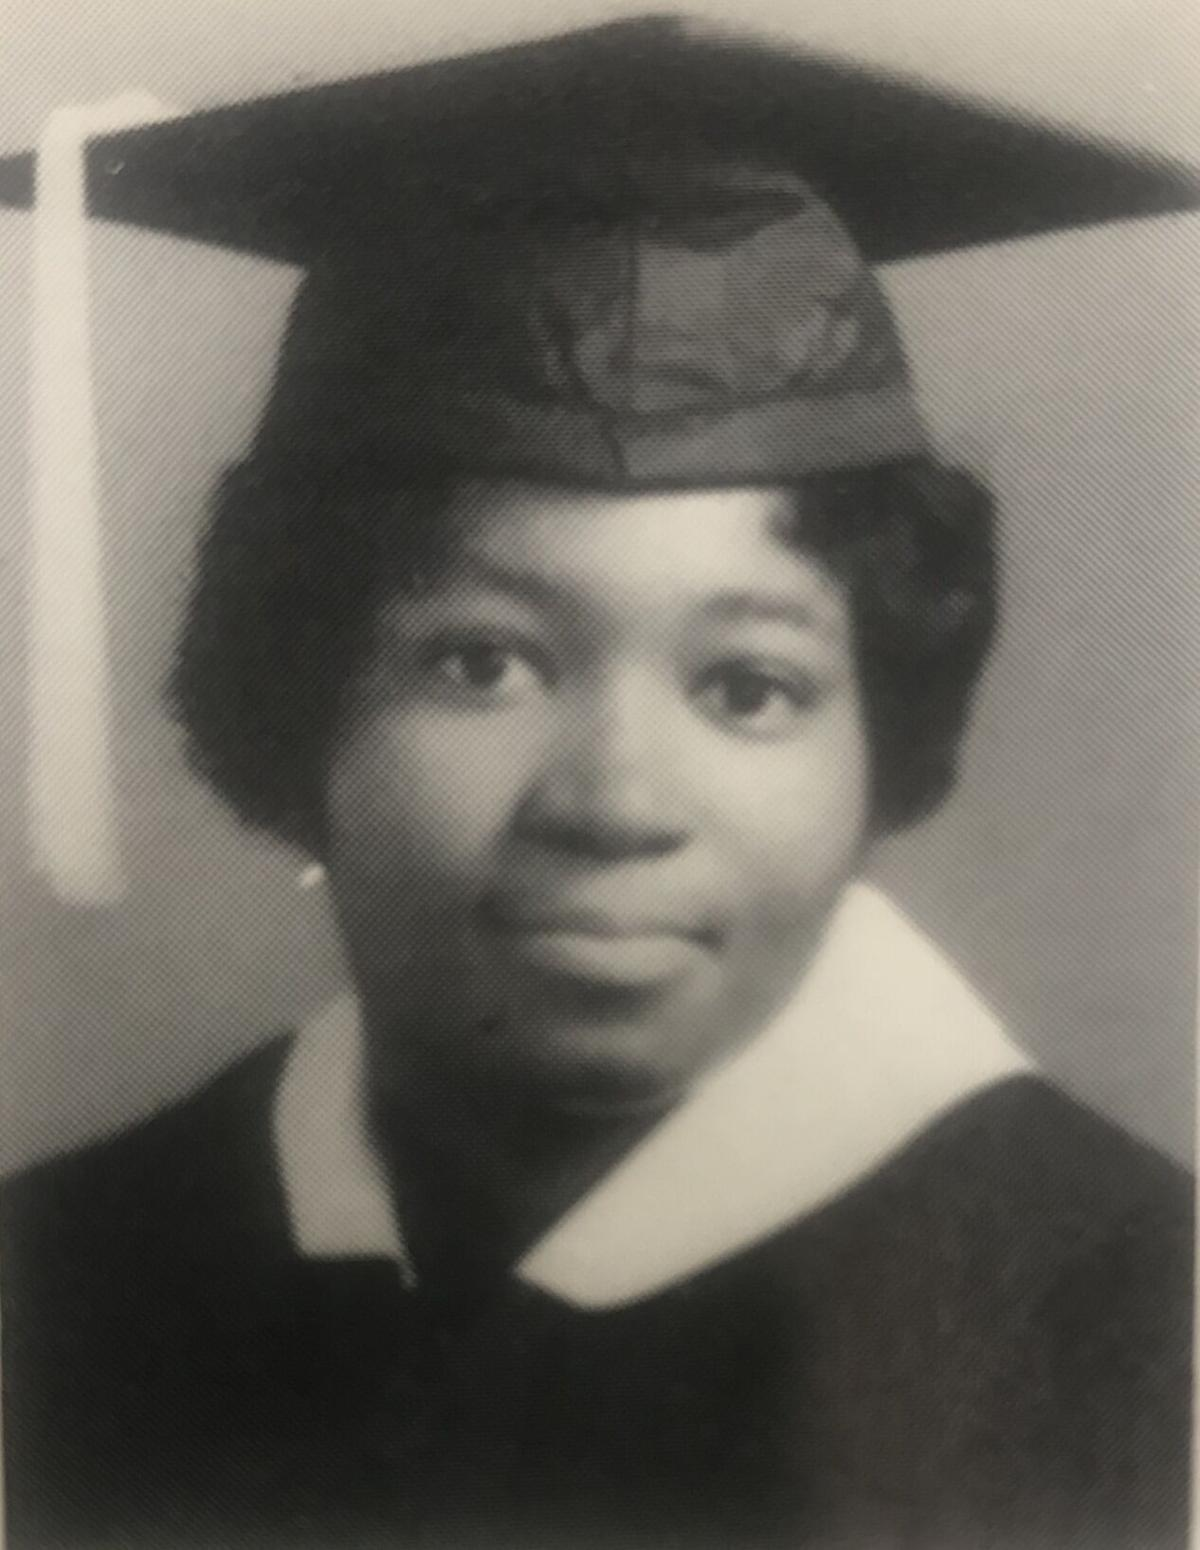 Green Davis 1966 graduation photo